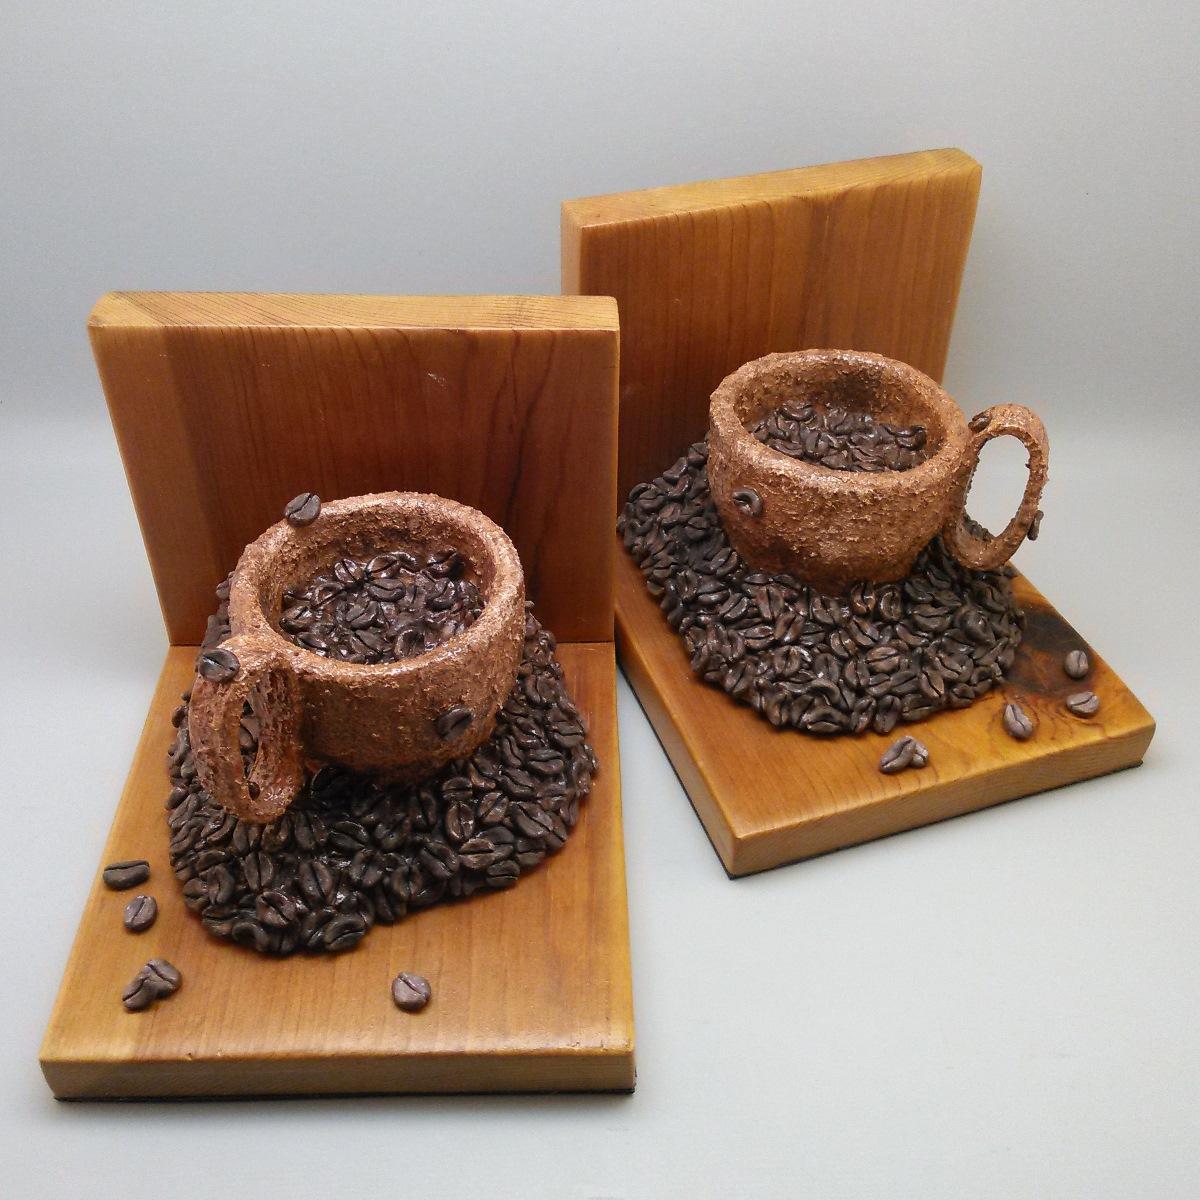 Java, Sweet and Hot...(a cup, a cup, a cup, a cup, a cup)